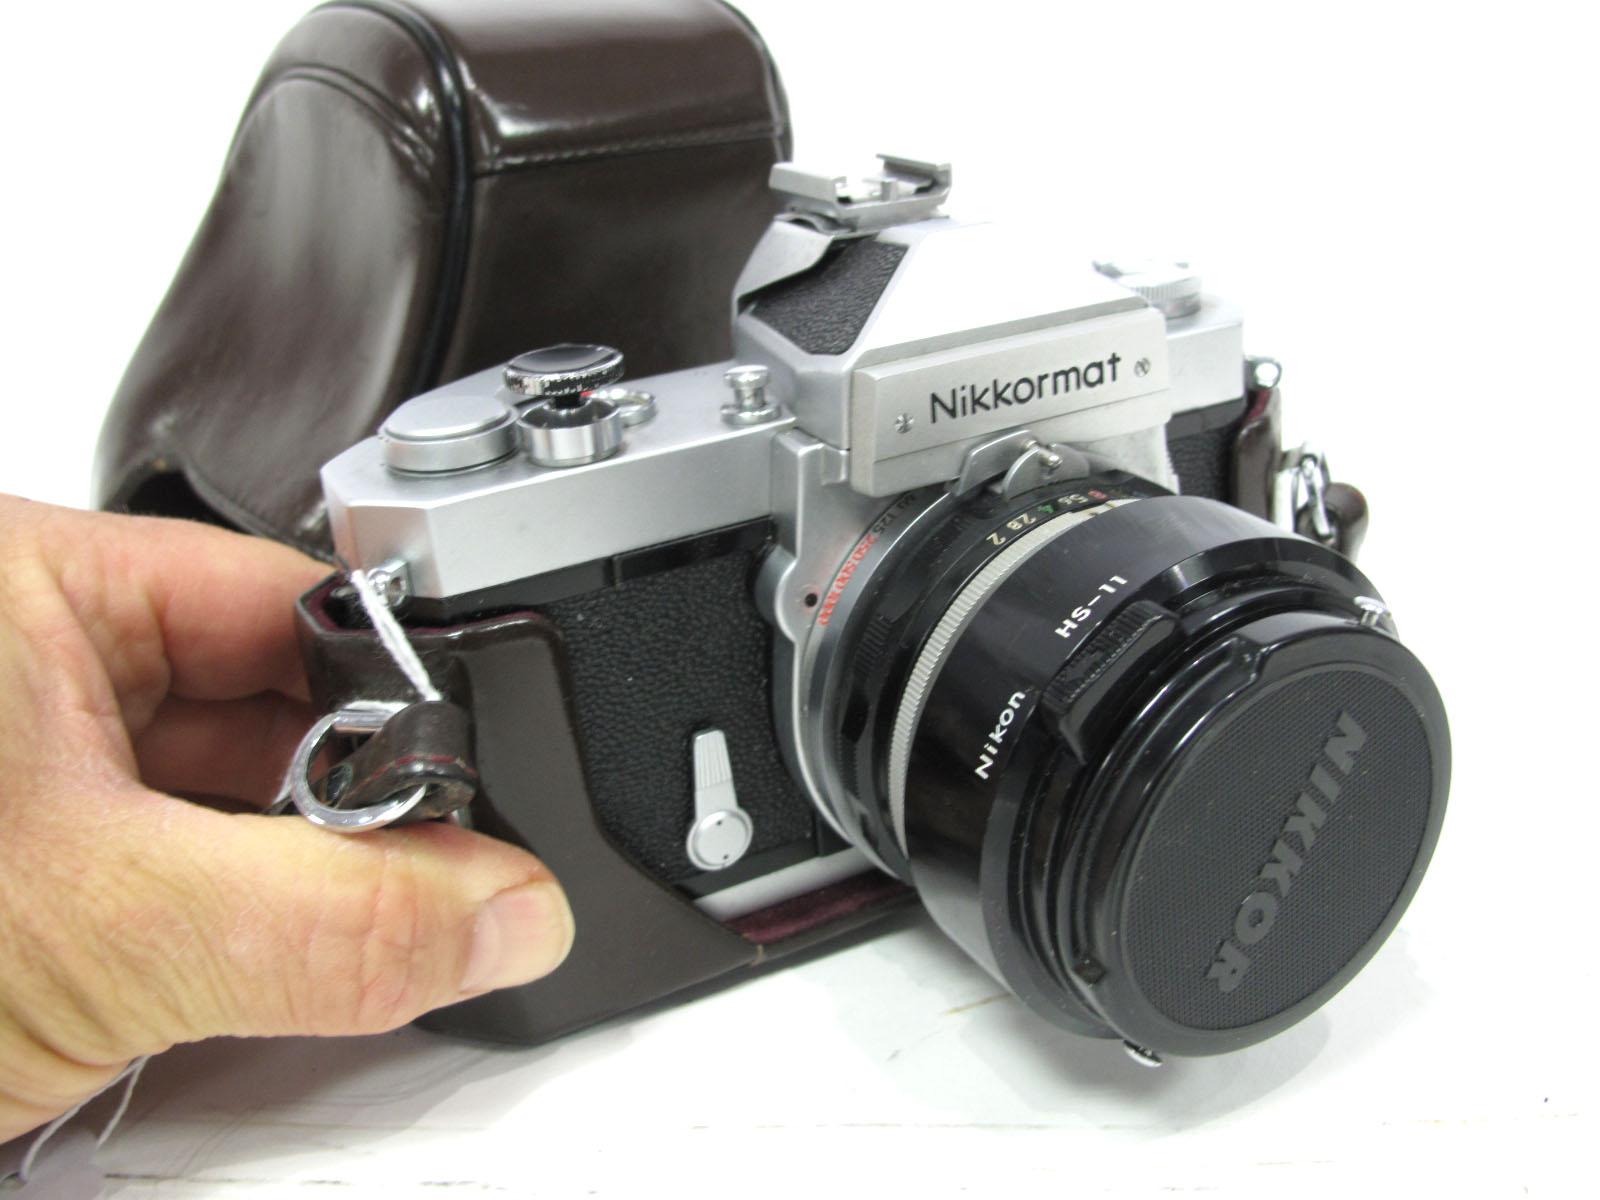 Nikkormat Camera, with Nikkor f=50mm lens in brown leather case.